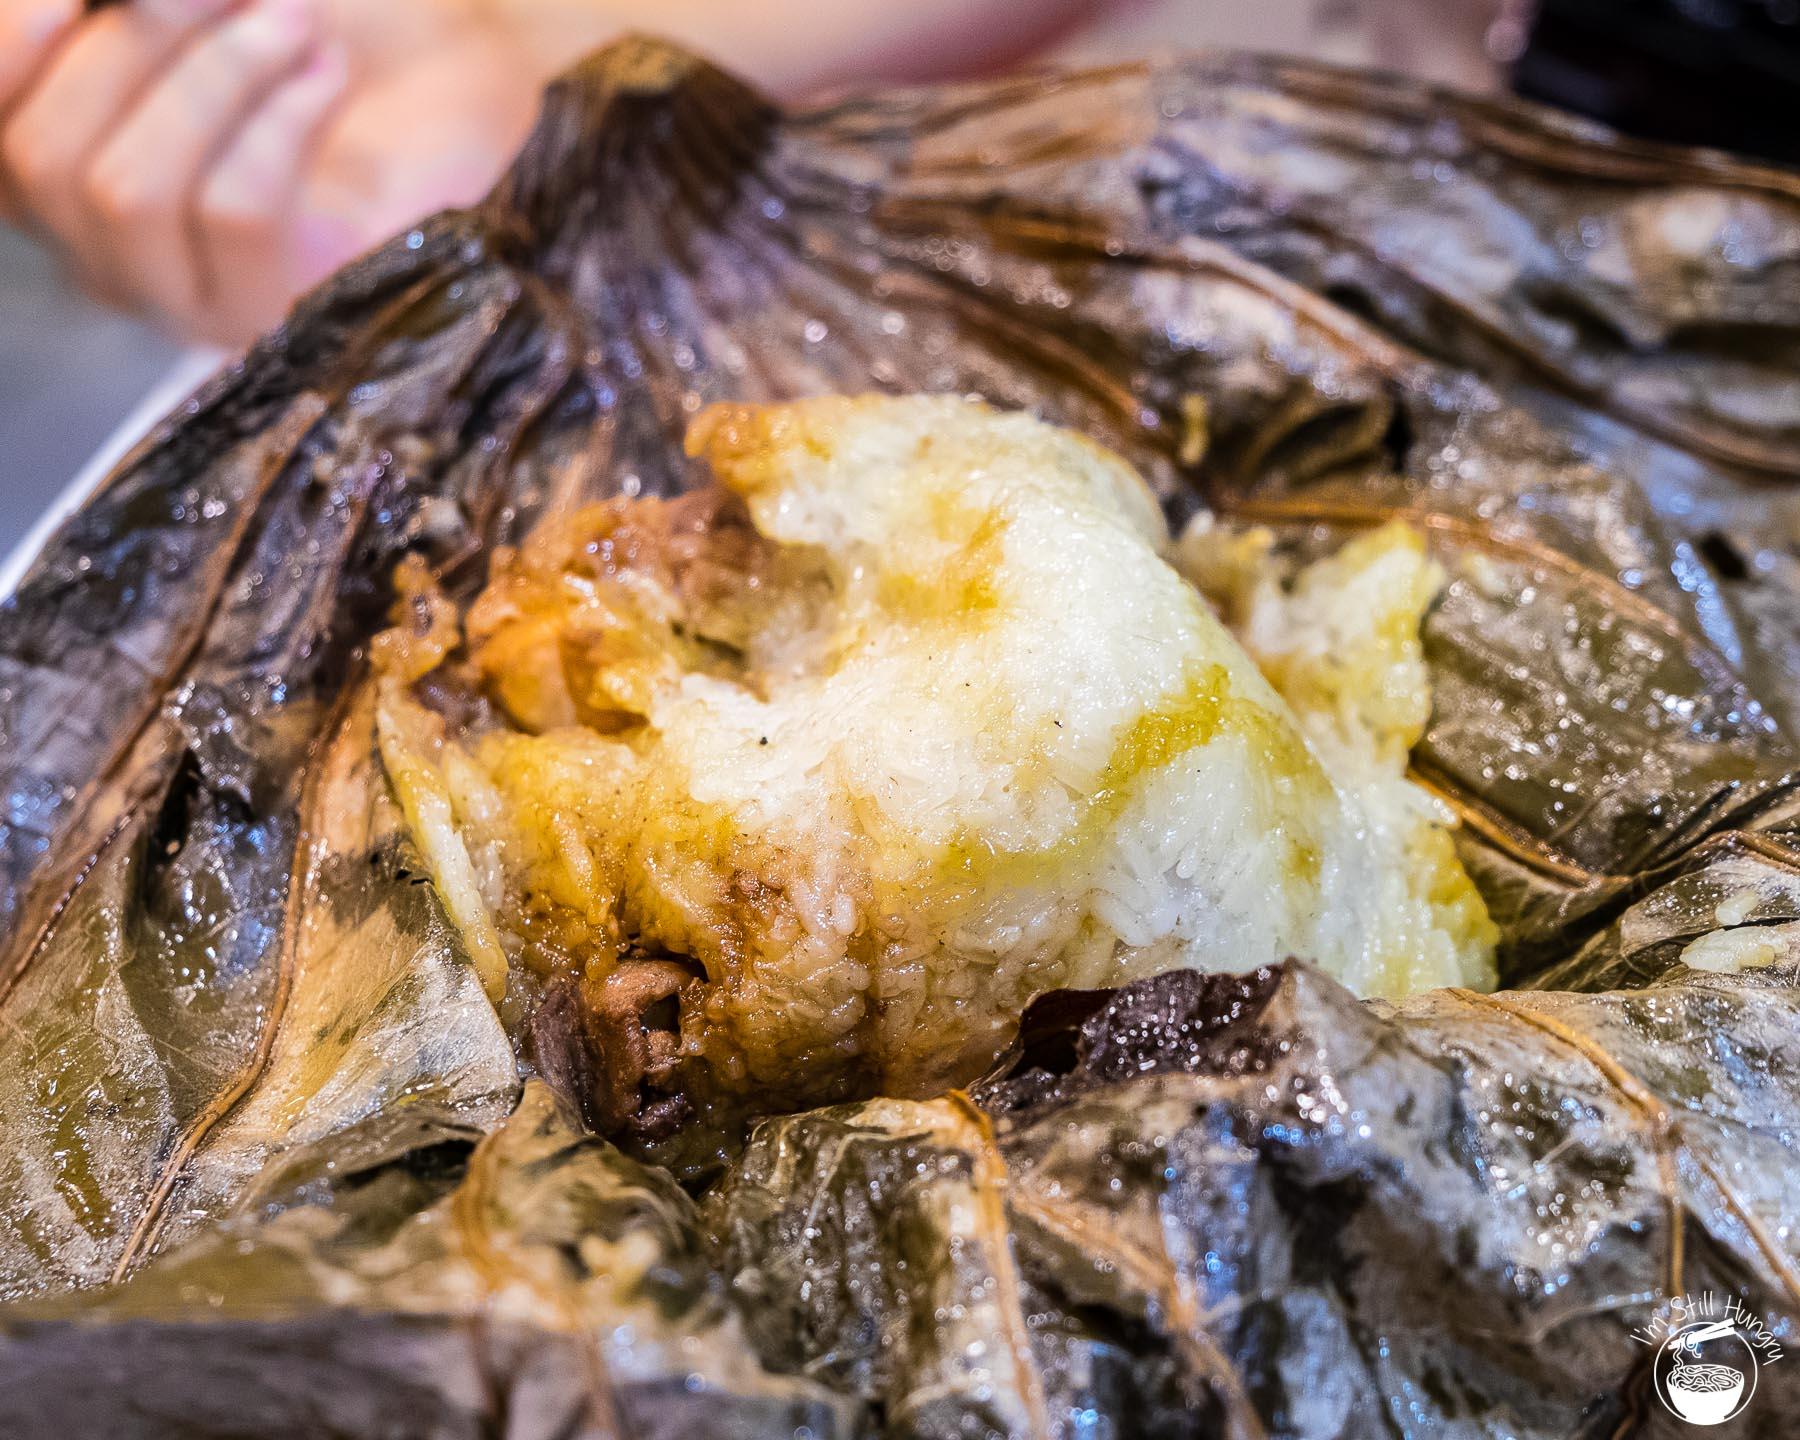 Tim Ho Wan Hong Kong Glutinous rice in lotus leaf w/chicken